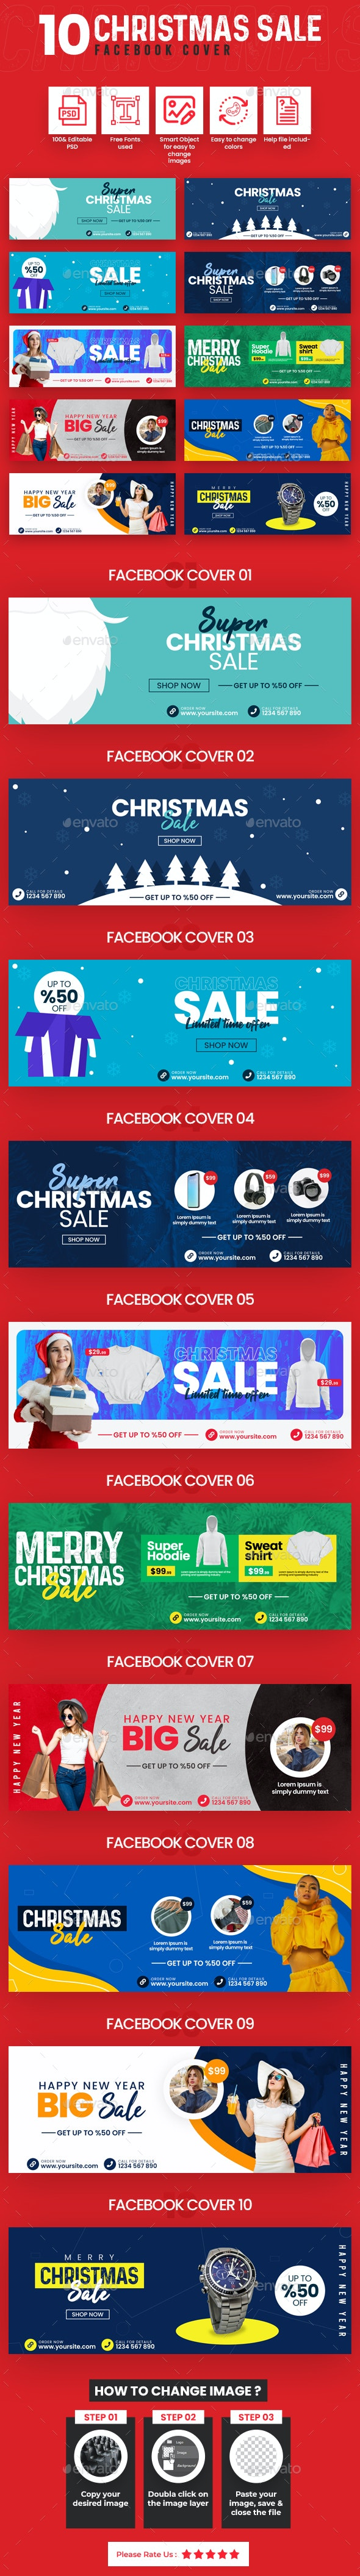 Christmas Sale 10 Facebook Cover - Facebook Timeline Covers Social Media